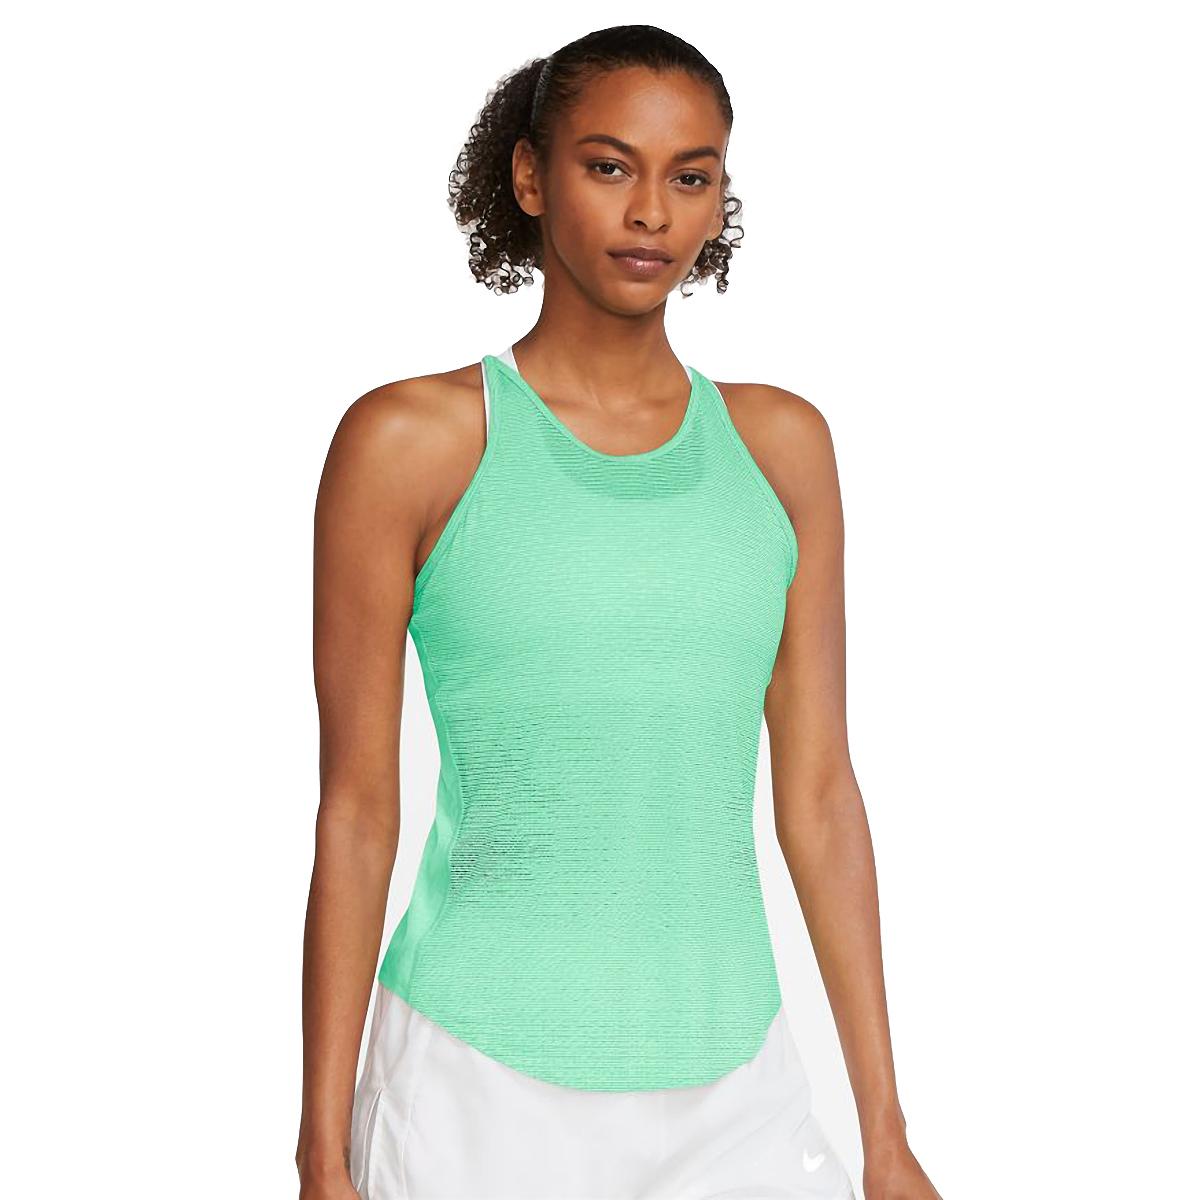 Women's Nike Run Division Engineered Running Tank - Color: Green Glow/White/Black - Size: S, Green Glow/White/Black, large, image 1